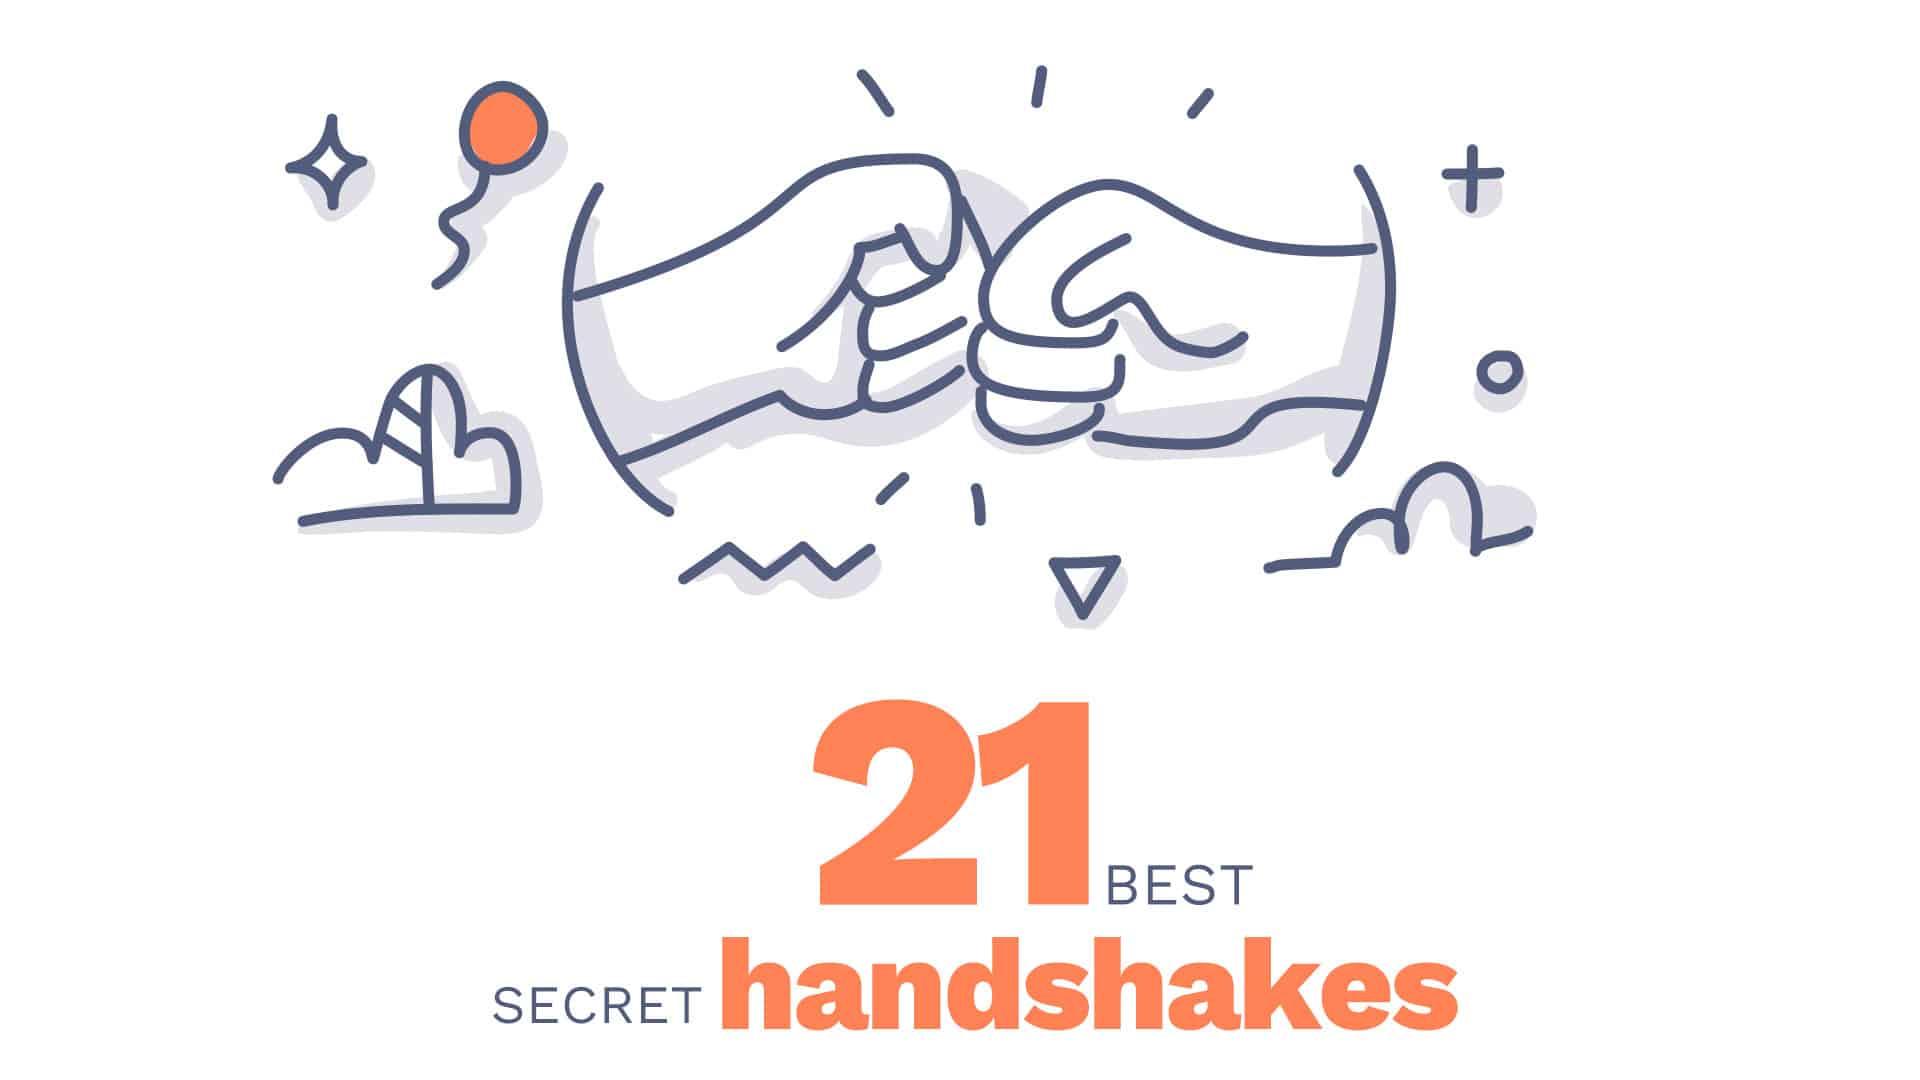 21-best-secret-handshakes-humor-that-works